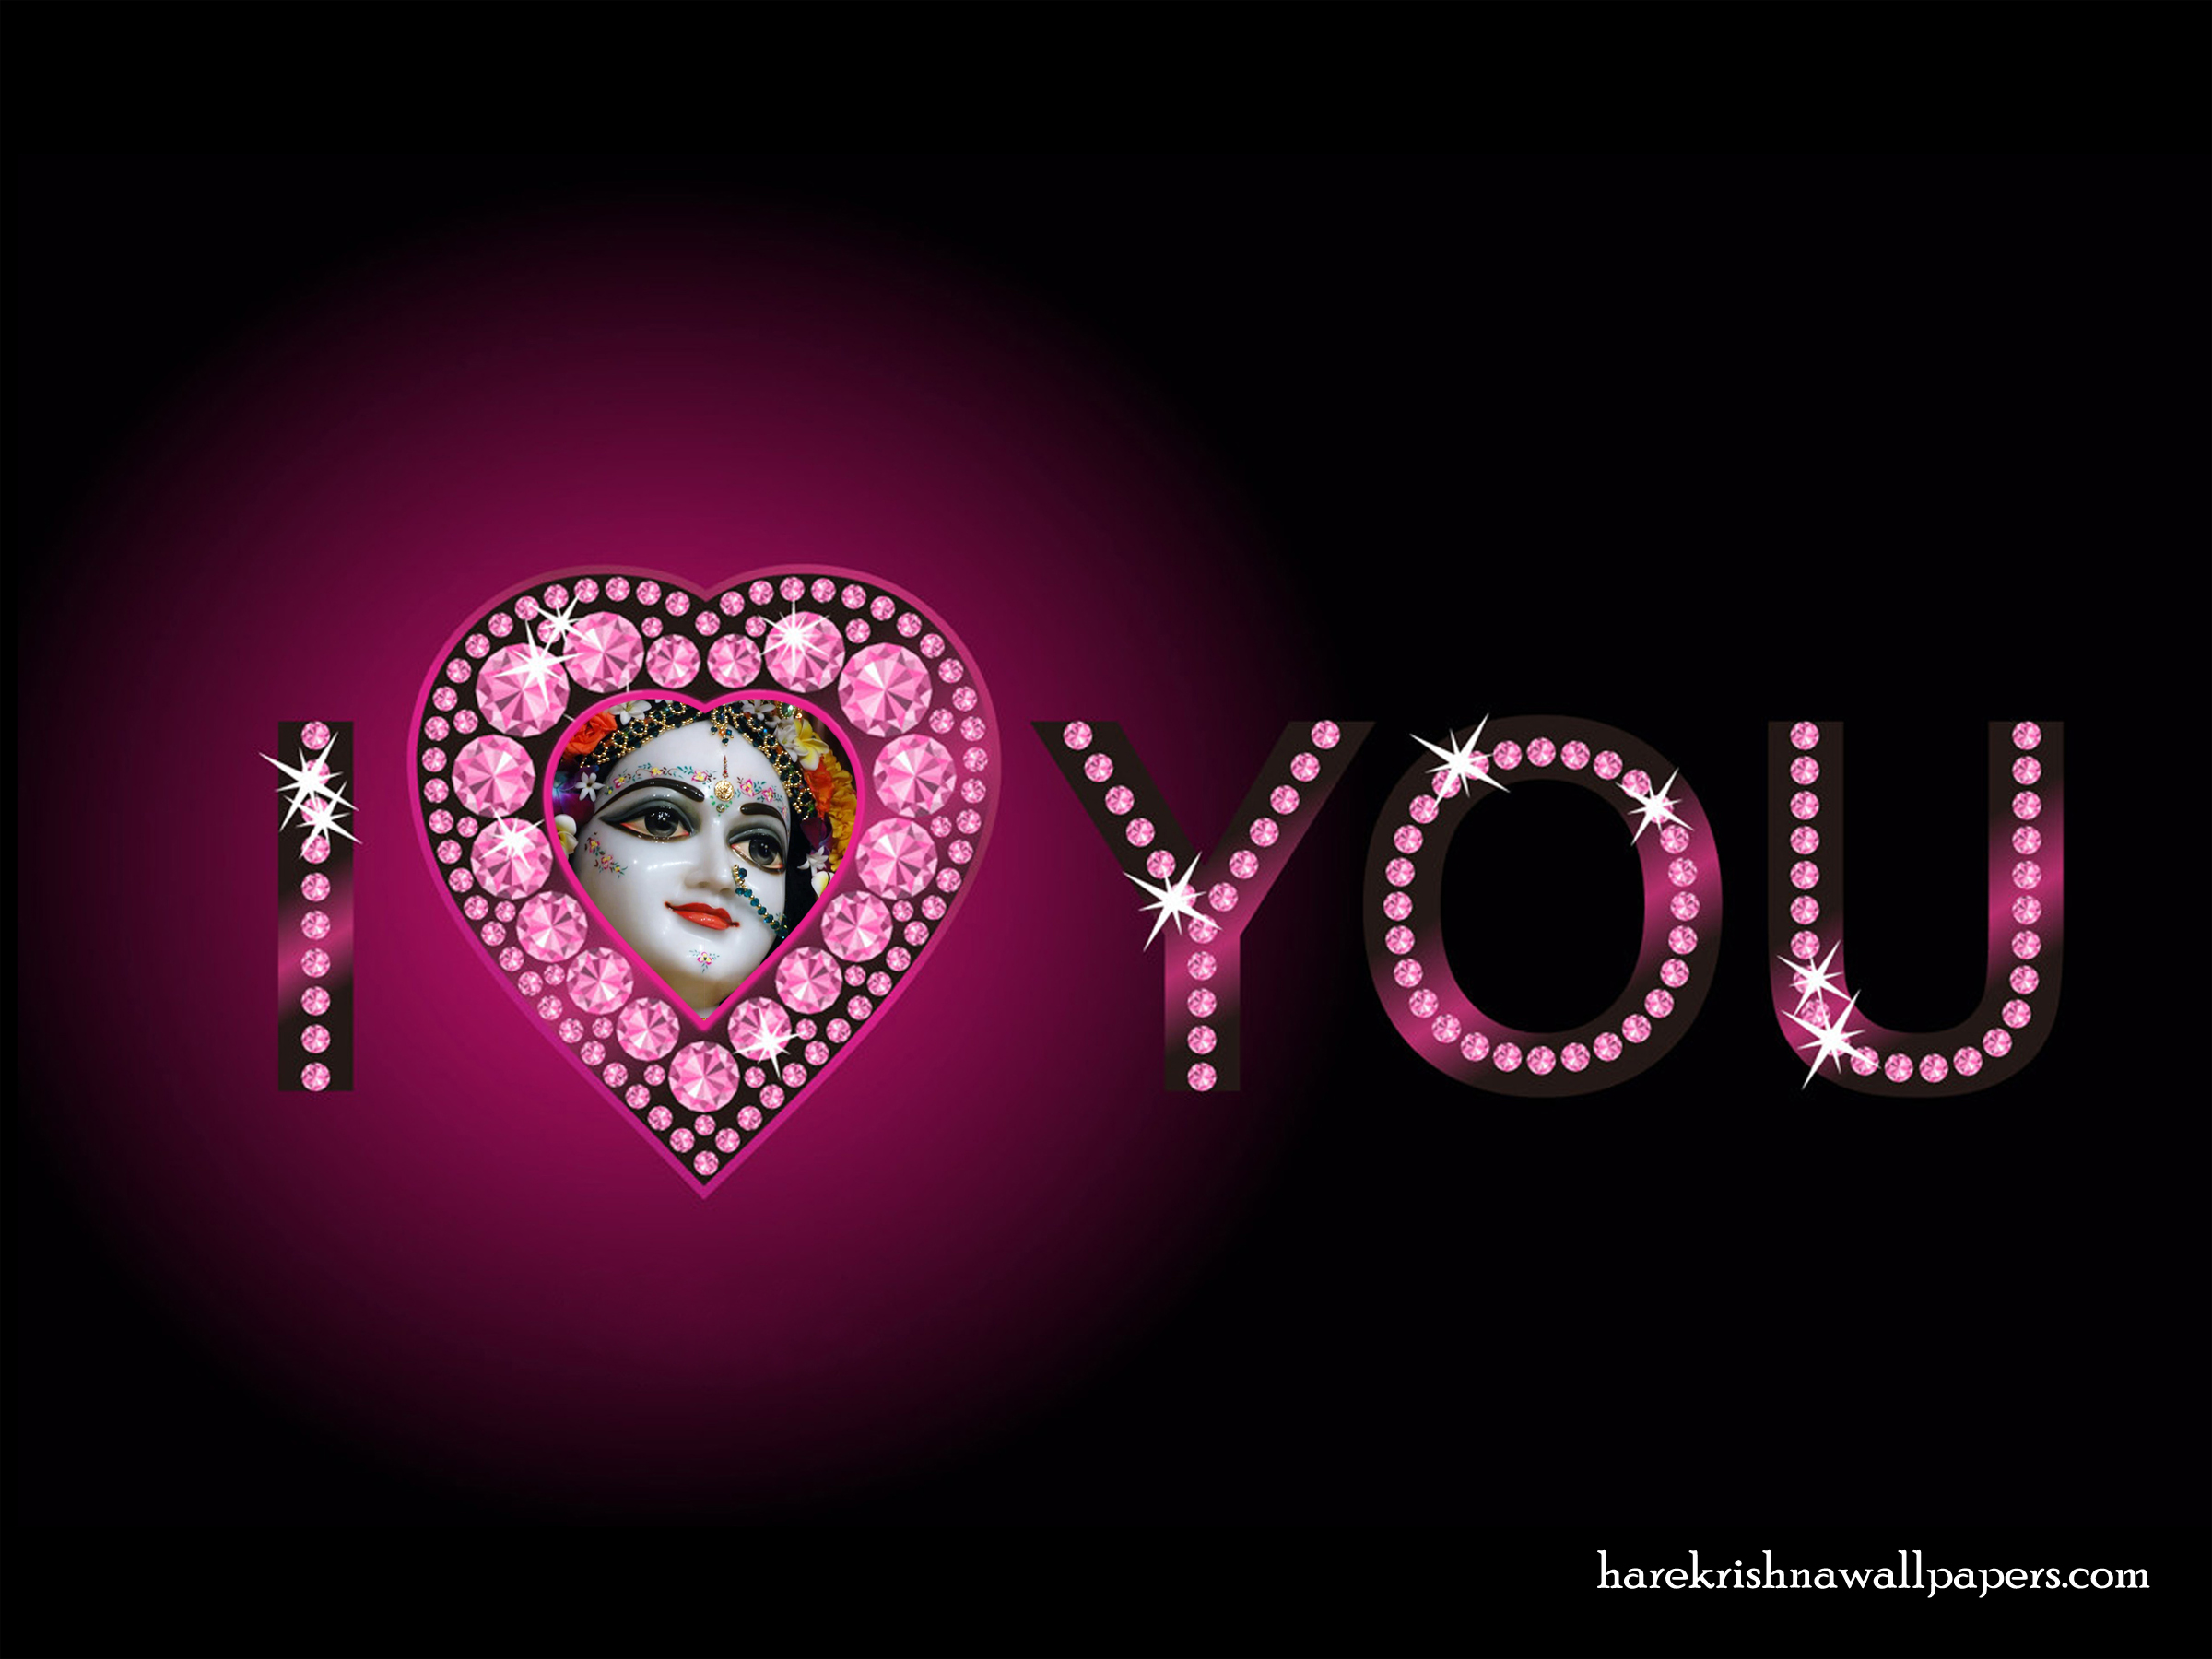 I Love You Radharani Wallpaper (013) Size 2400x1800 Download